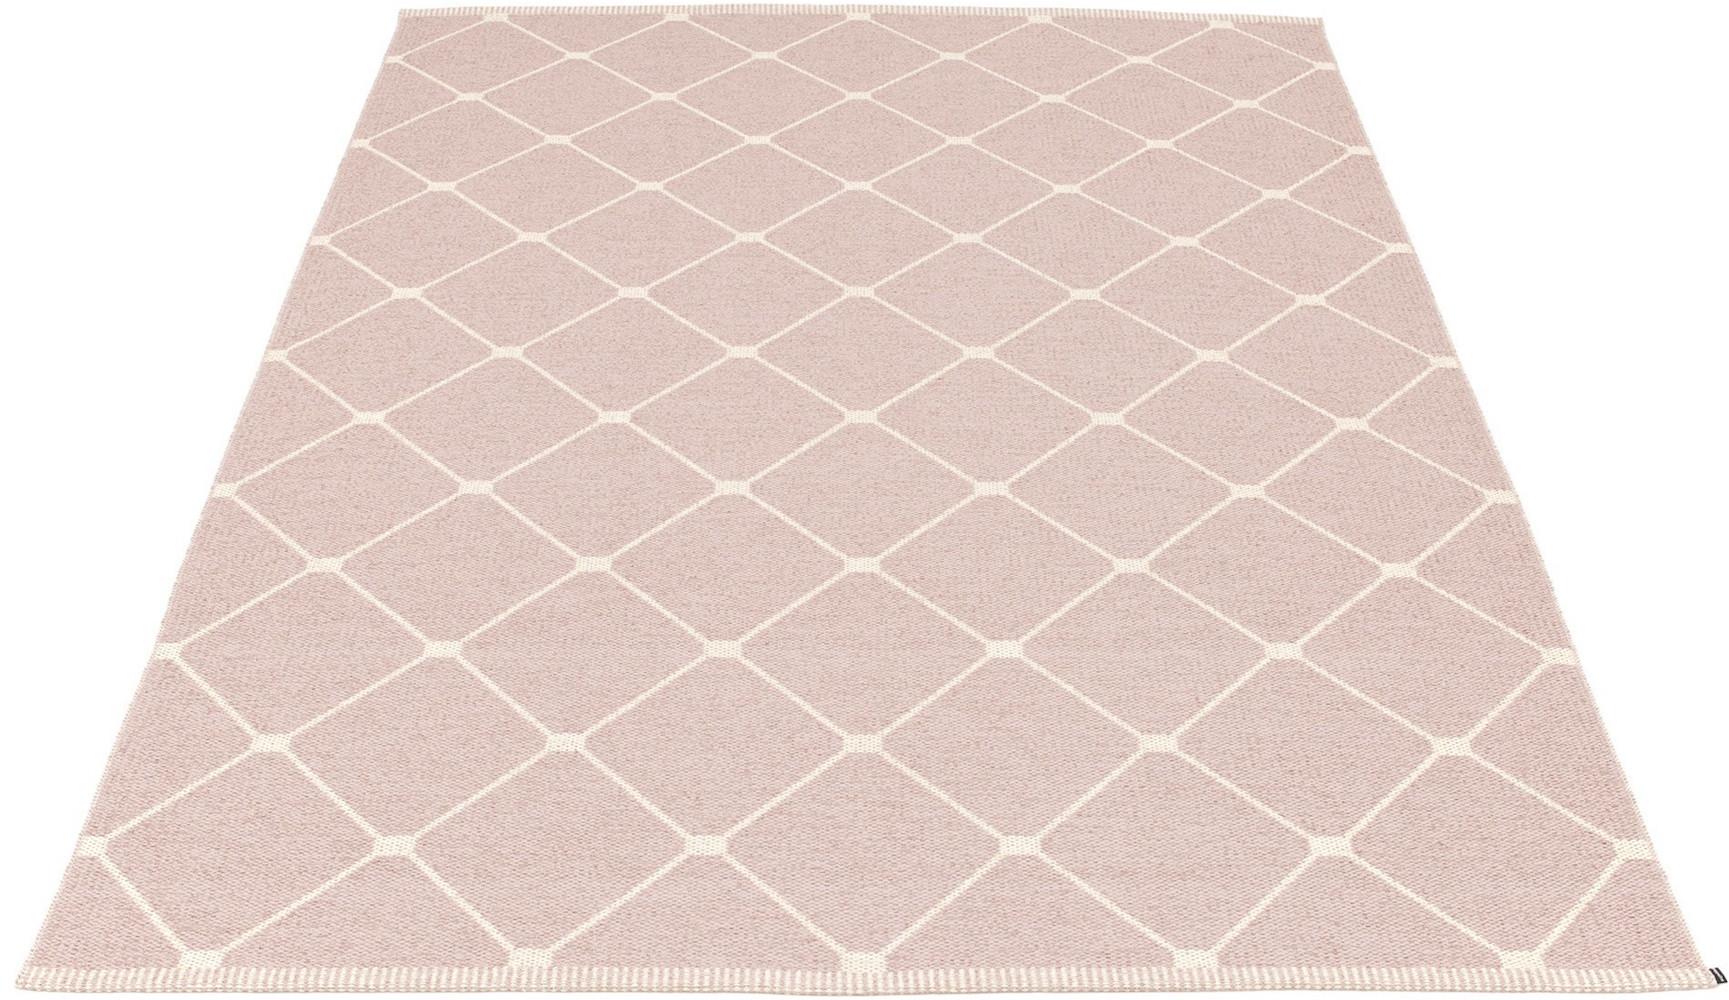 pappelina tapis grand format regina design lina rickardsson. Black Bedroom Furniture Sets. Home Design Ideas